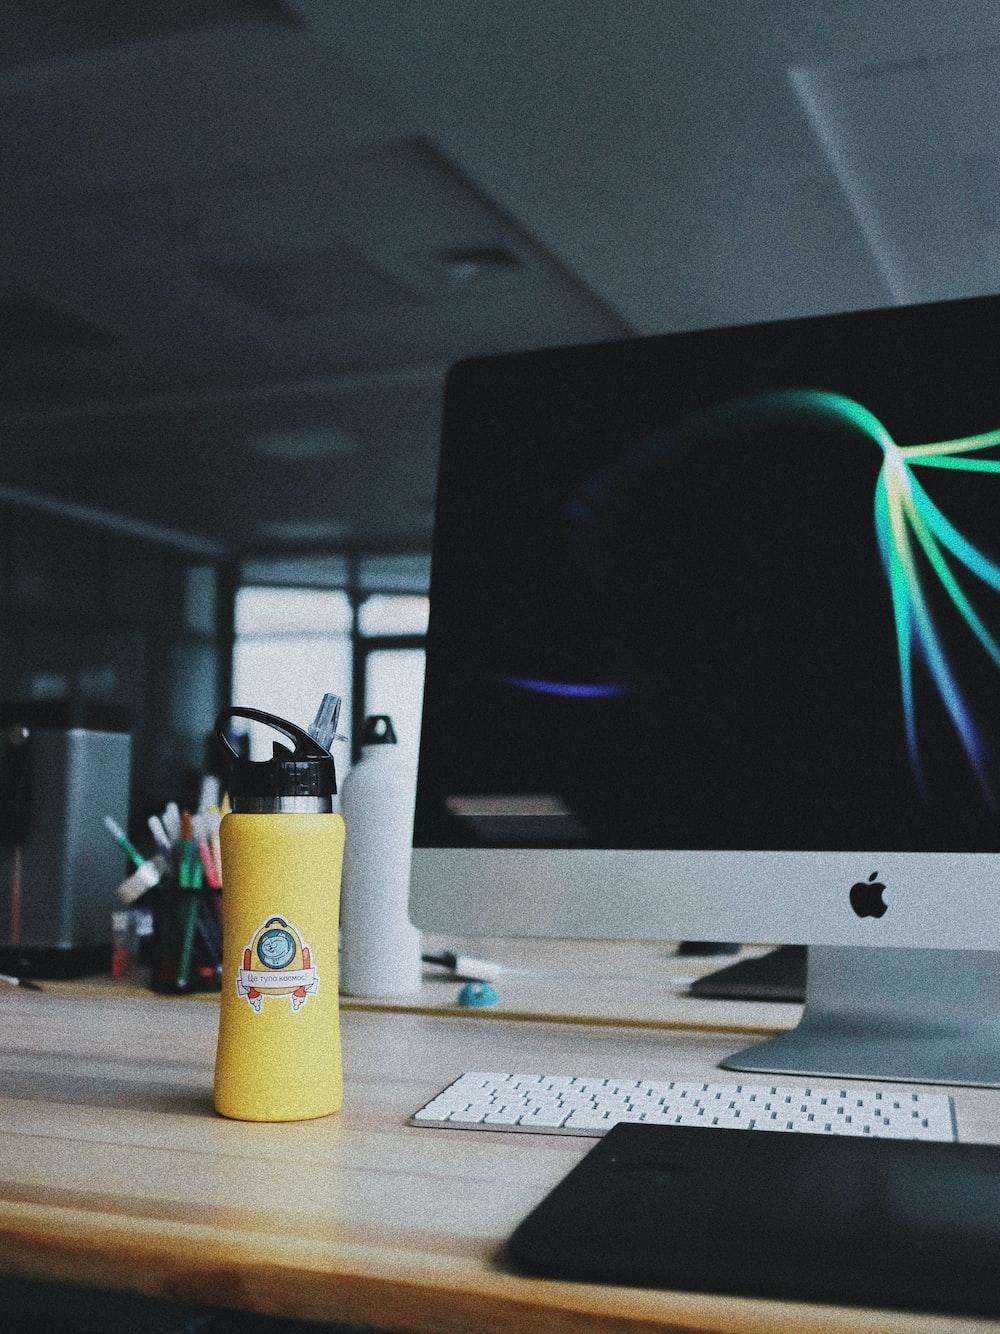 powered on silver iMac beside yellow tumbler